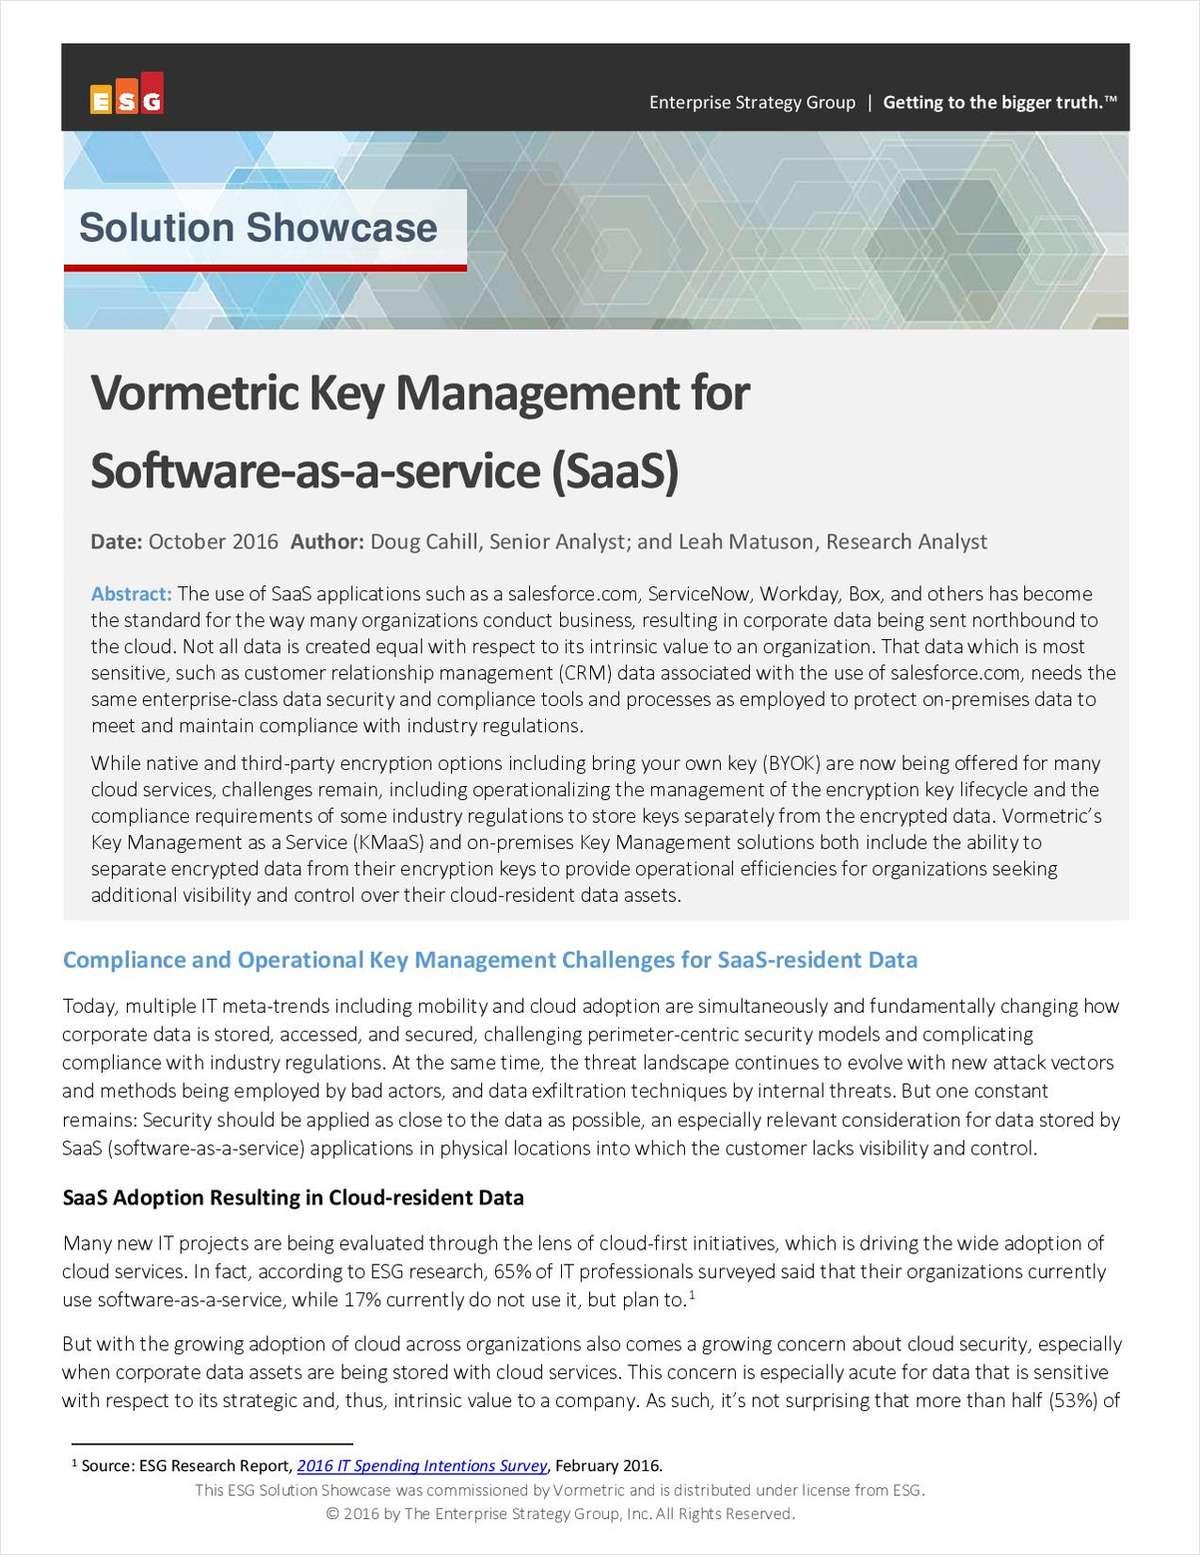 Solution Showcase: Vormetric Key Management for SaaS